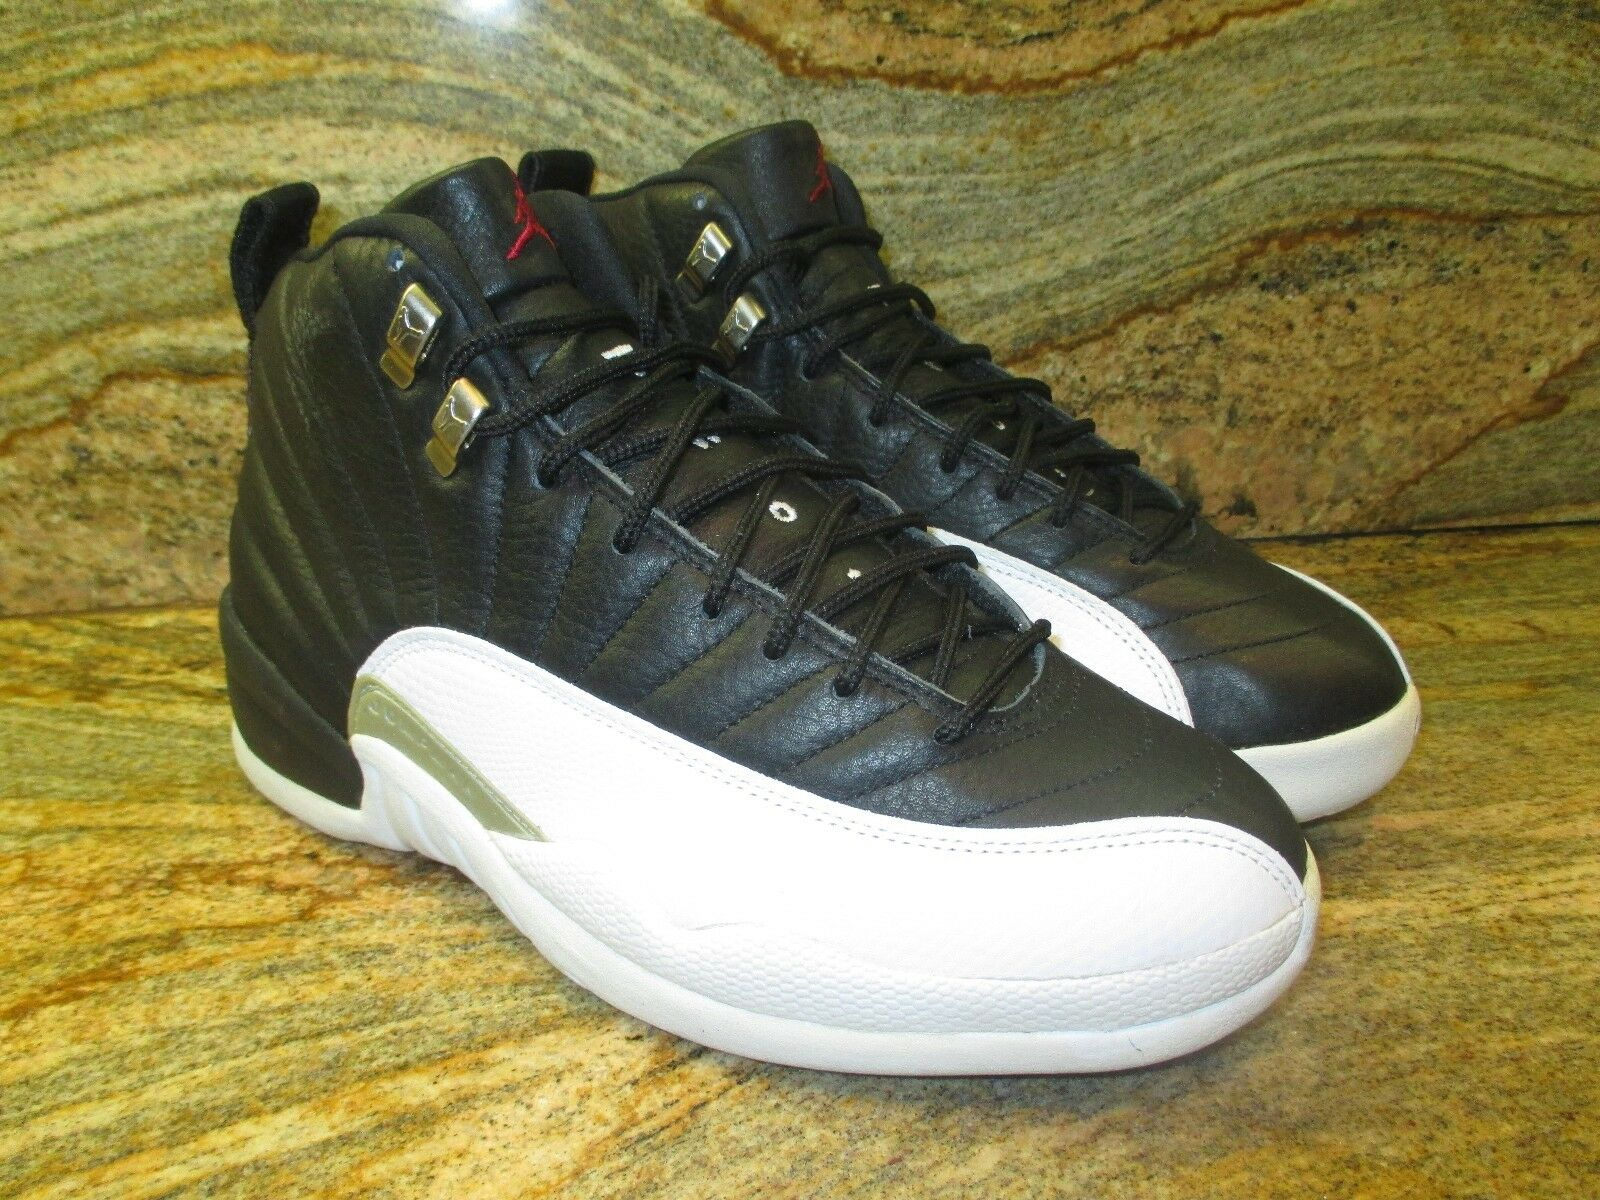 1997 Nike Air Jordan XII 12 OG Sample SZ 9 White Black Playoffs Taxi 136001-061